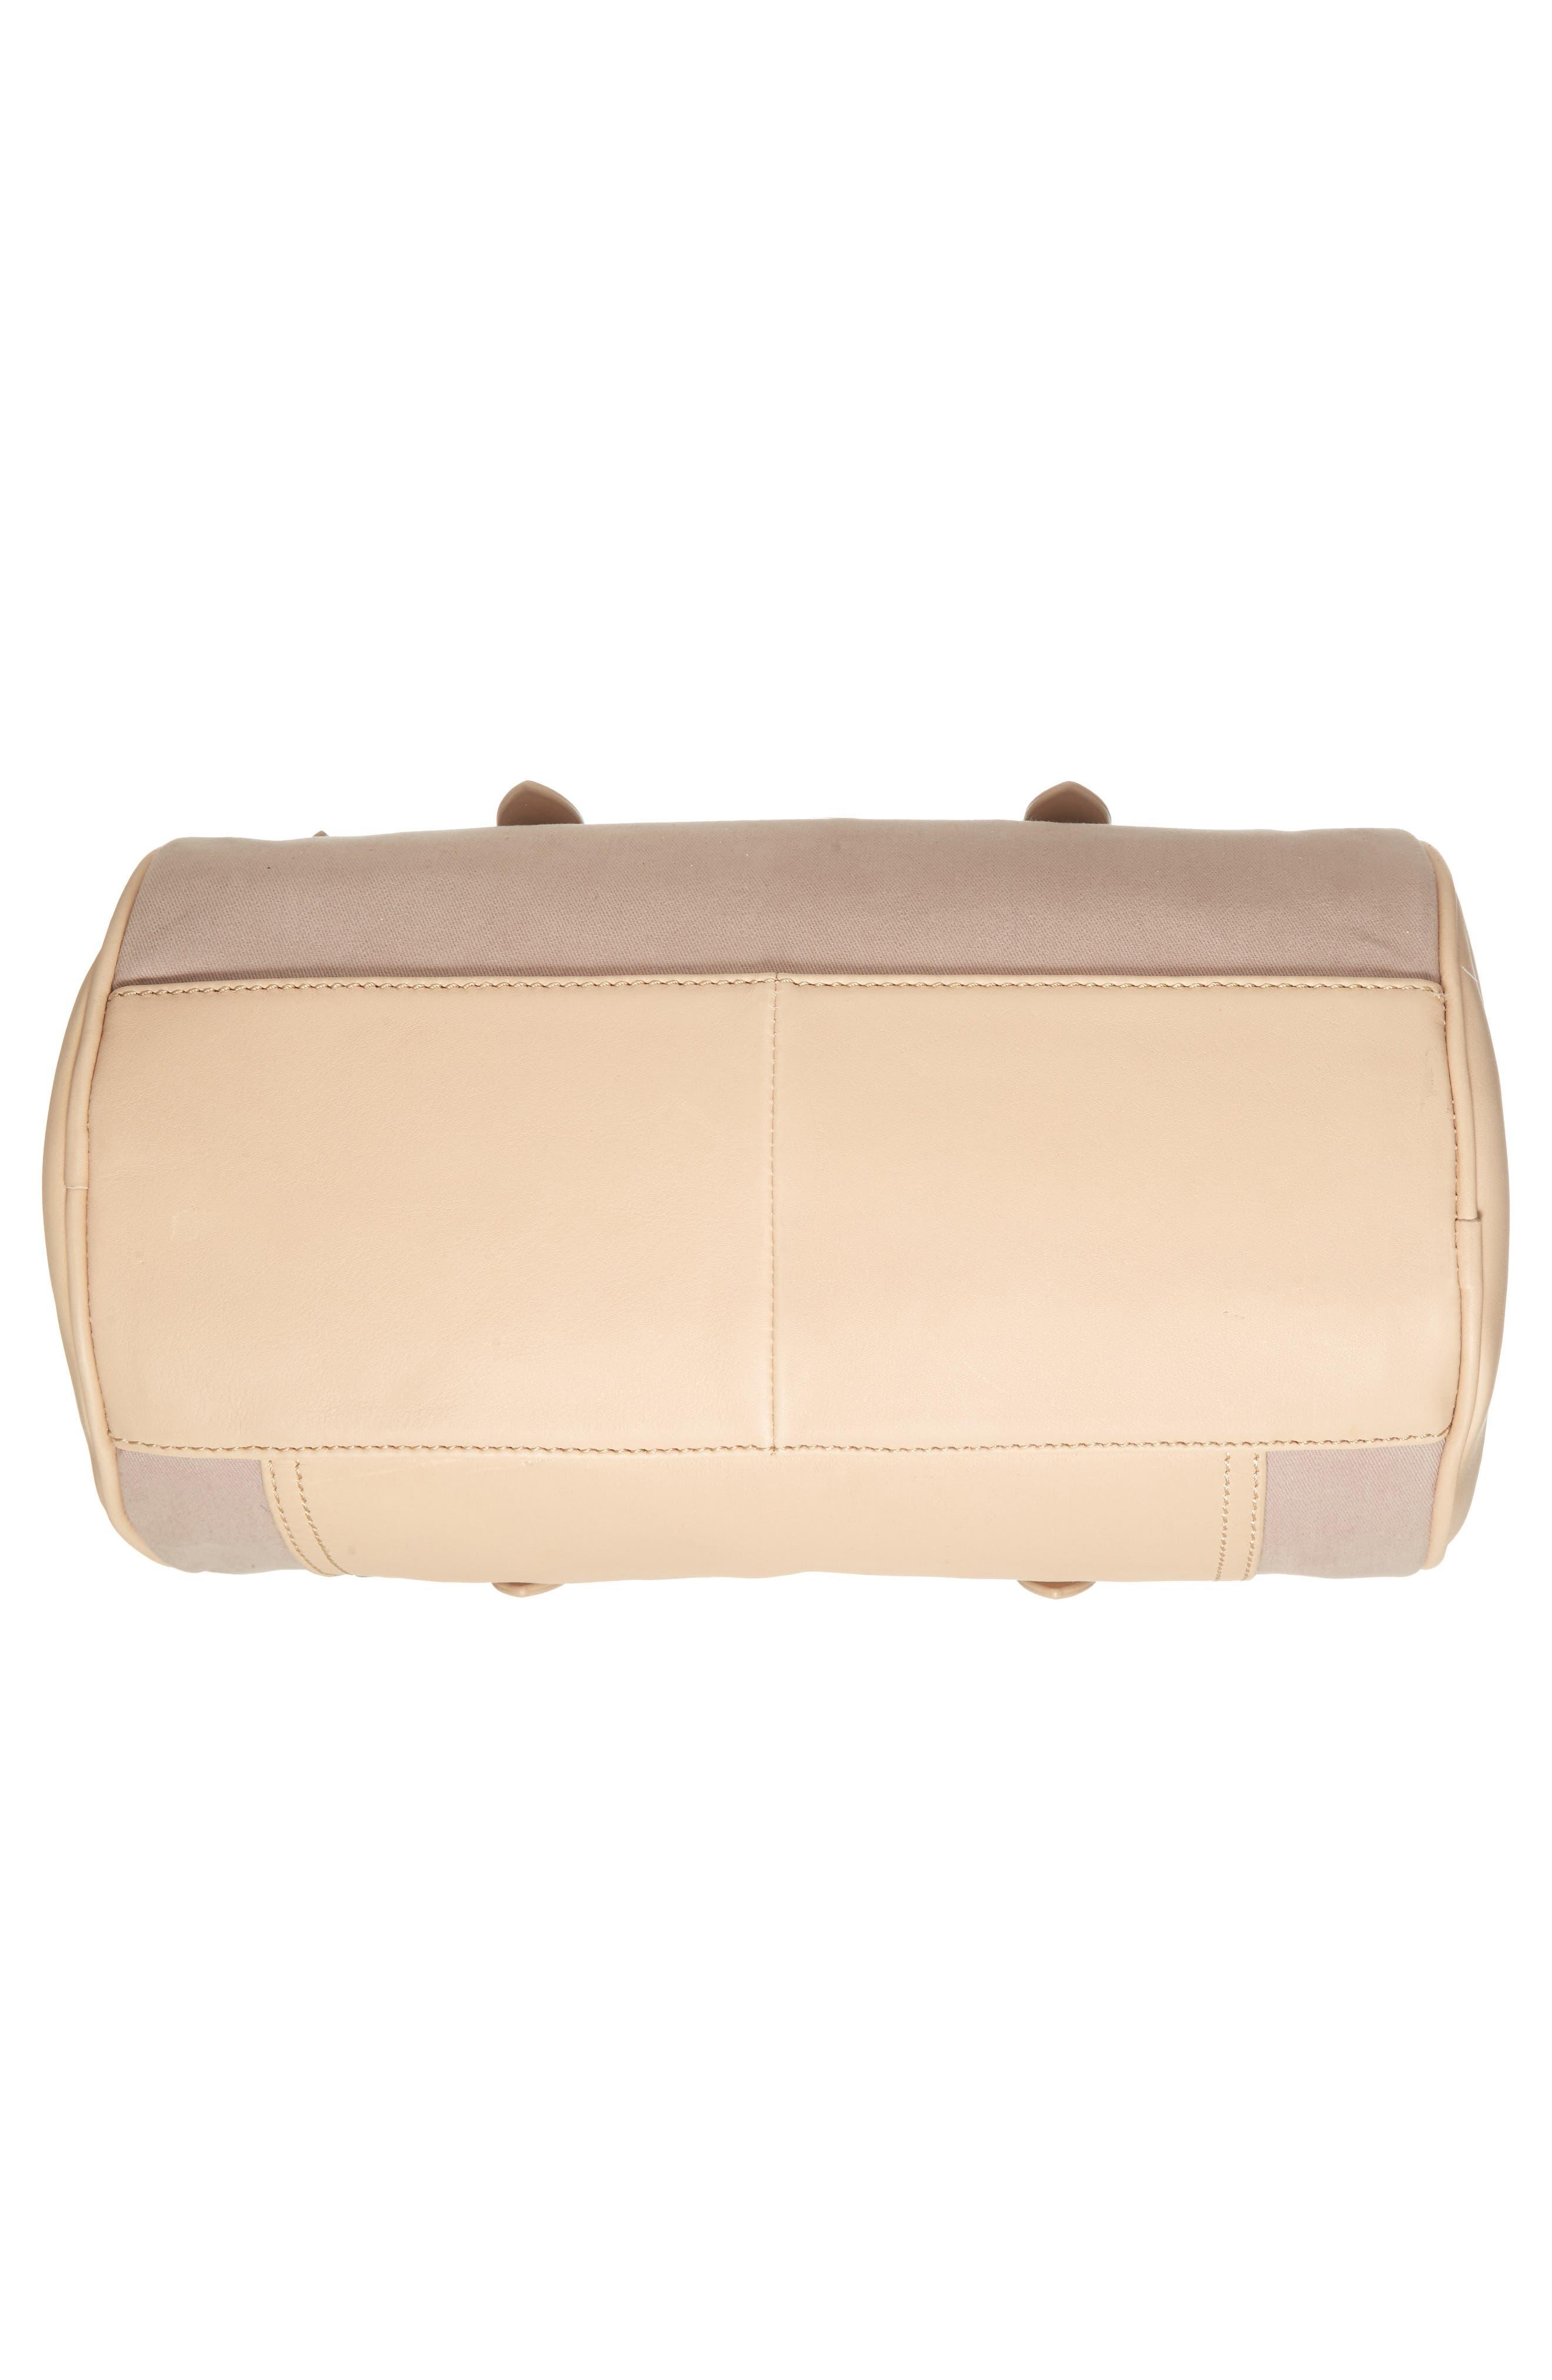 Mini Carml Leather & Canvas Barrel Bag,                             Alternate thumbnail 6, color,                             050